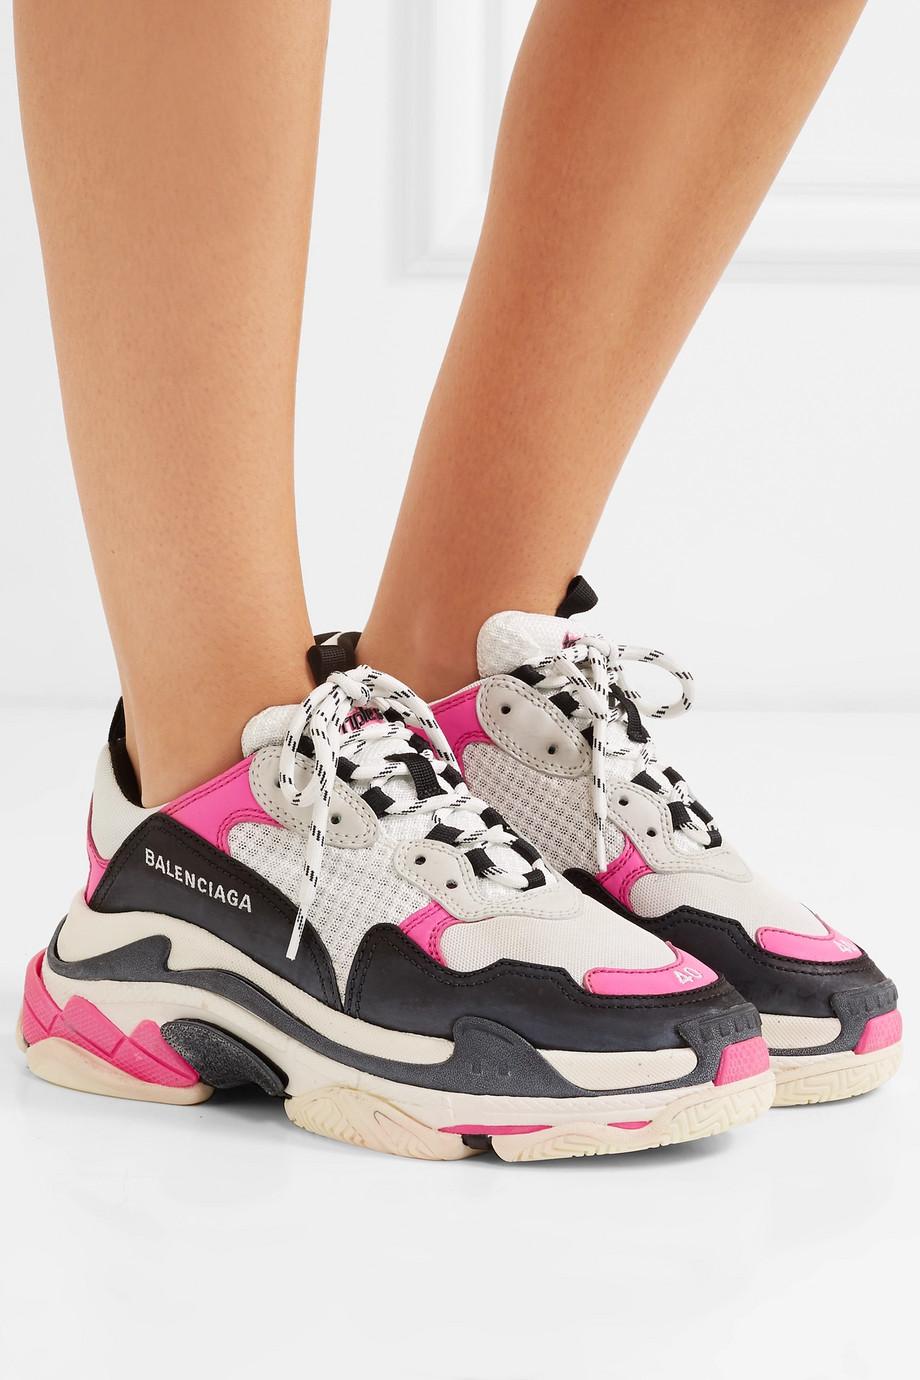 Balenciaga Triple S 品牌标志刺绣皮革牛巴革网眼运动鞋